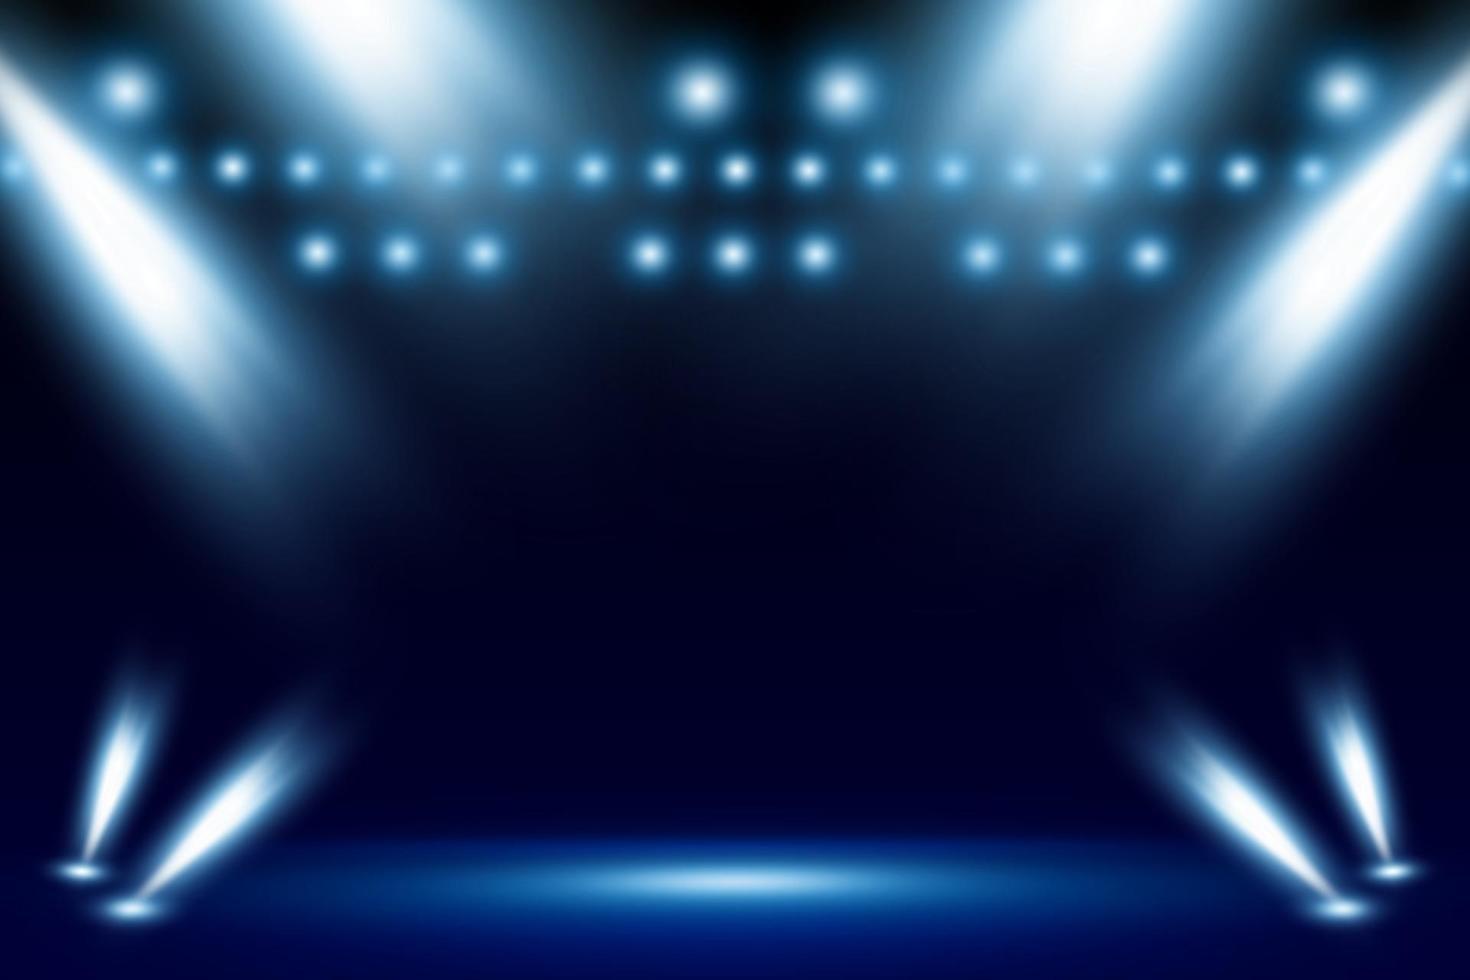 spotlight bakgrund vektorillustration vektor